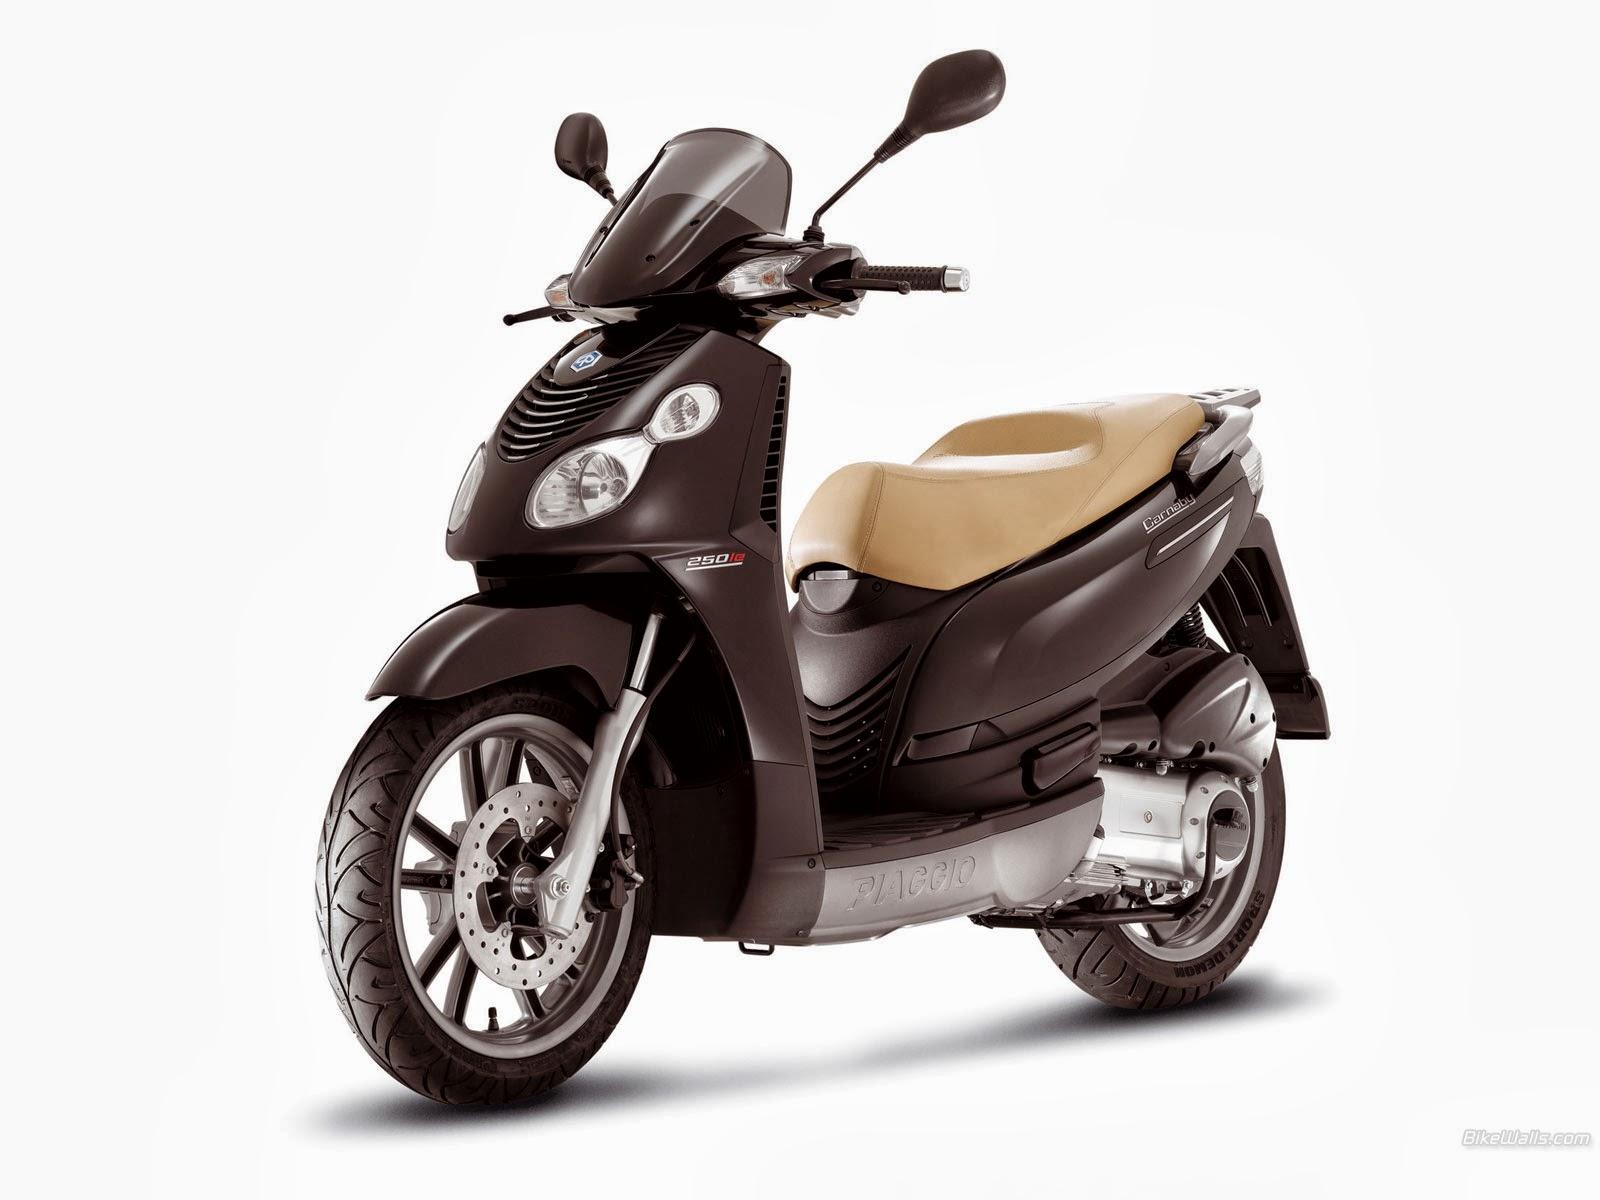 Piaggio Carnaby 250 IE - Piaggio Motor